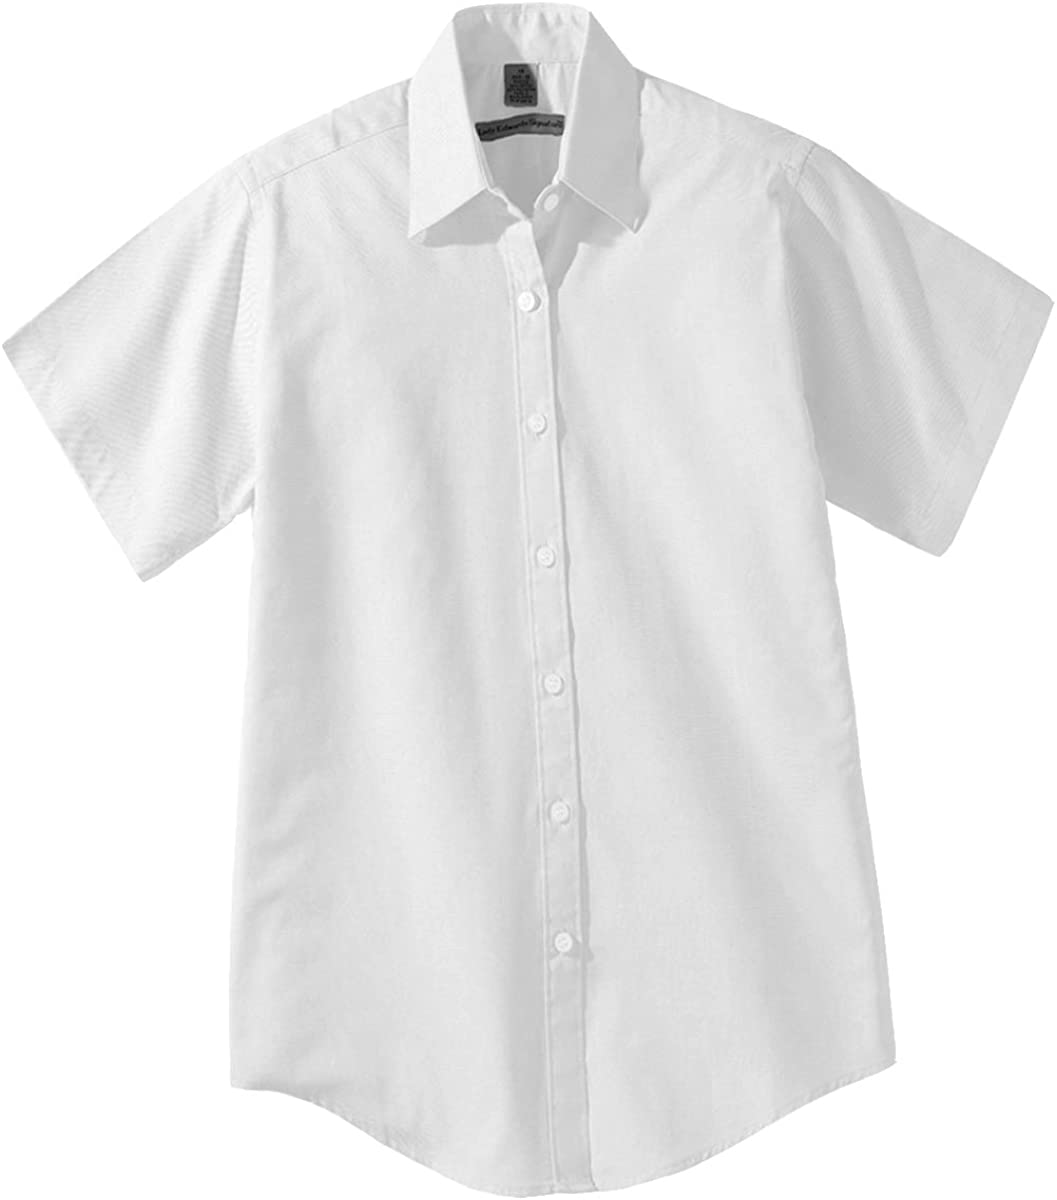 Edwards Men's Short Sleeve Pinpoint Oxford Shirt